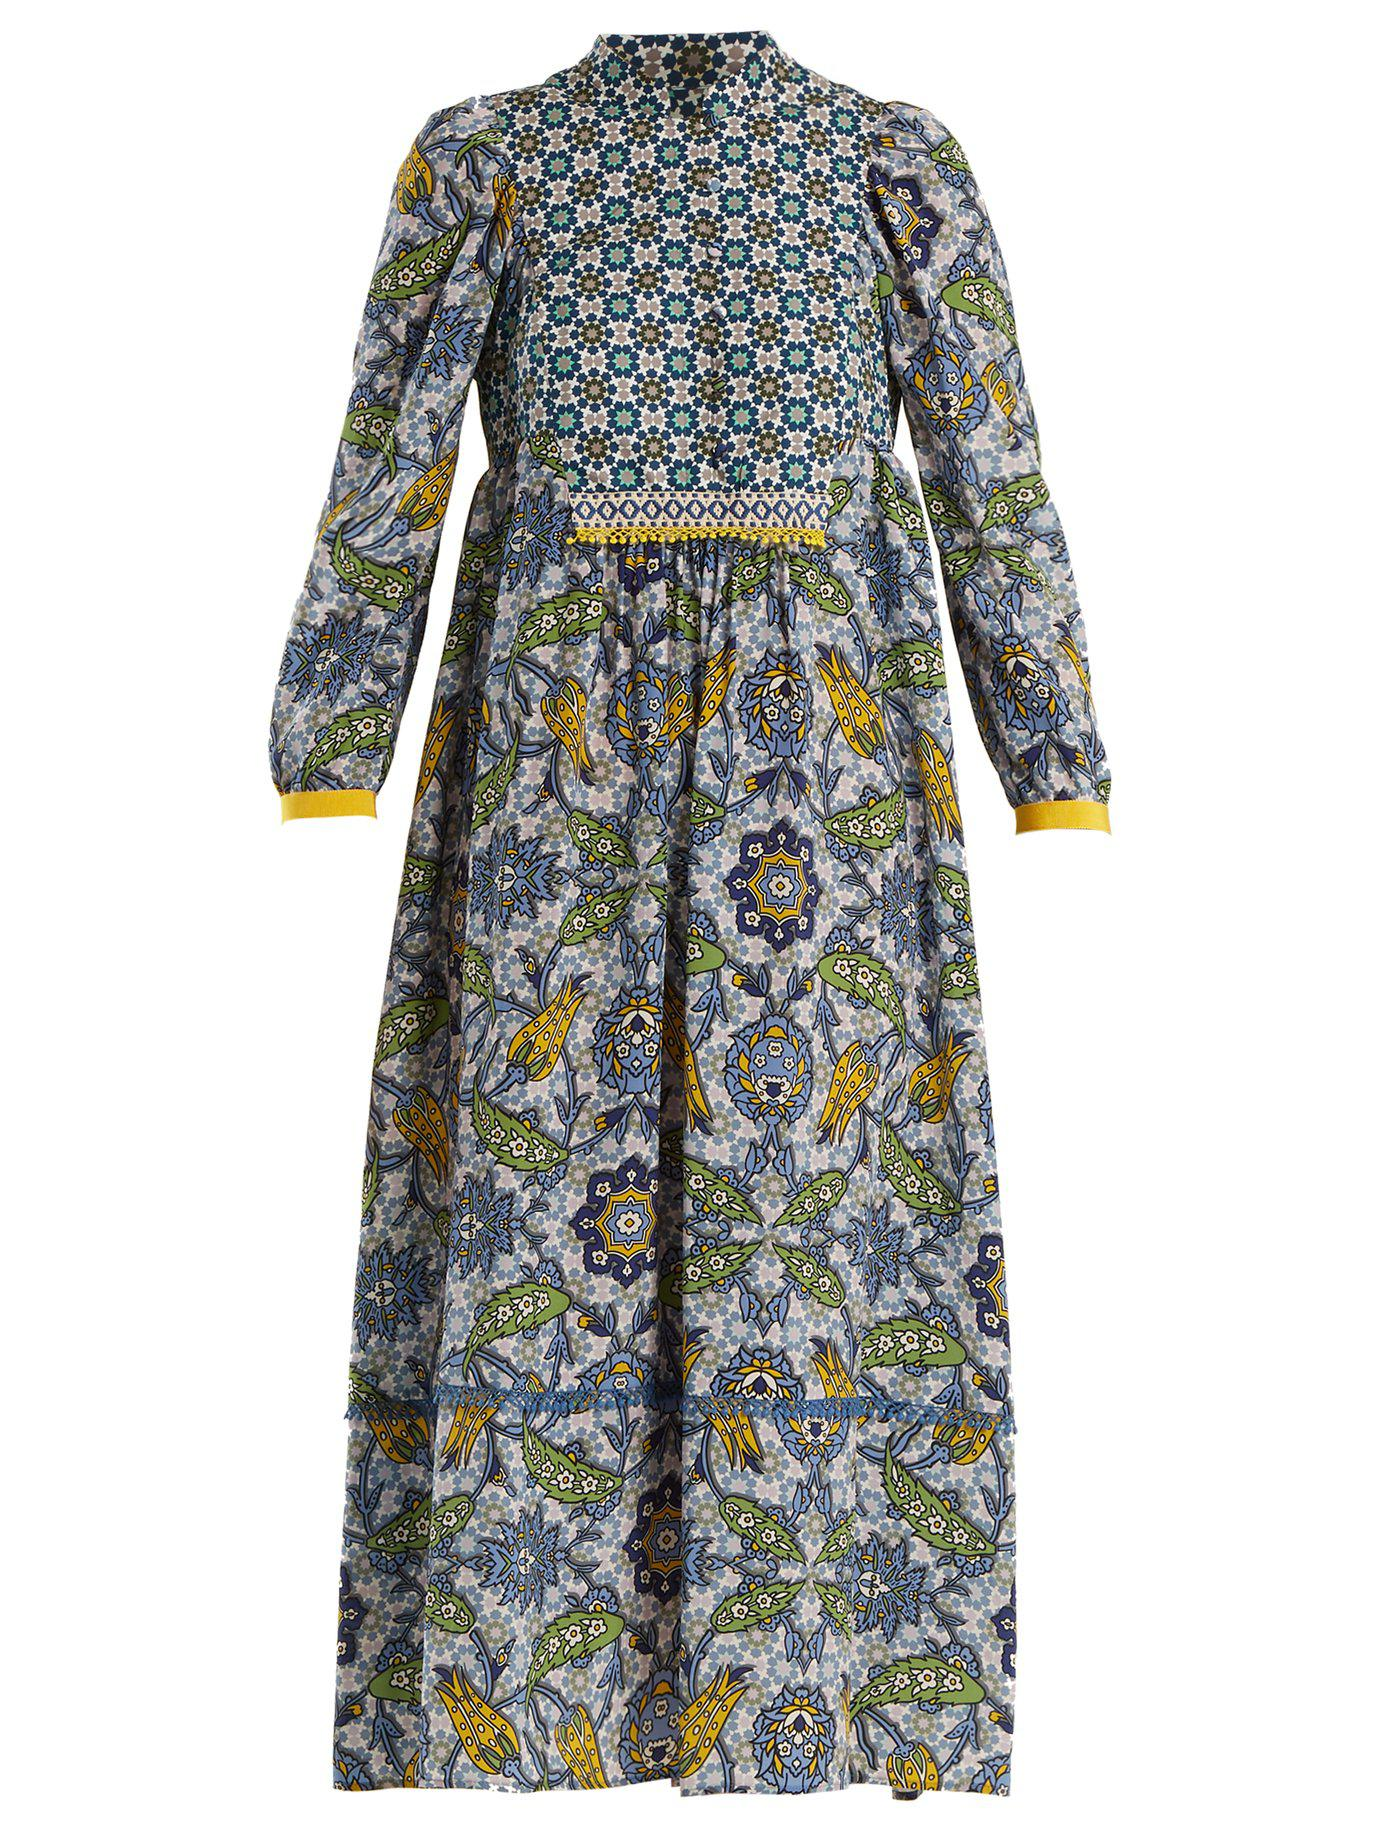 Maxmara Oriente Weekend Robe By Lyst qI15E